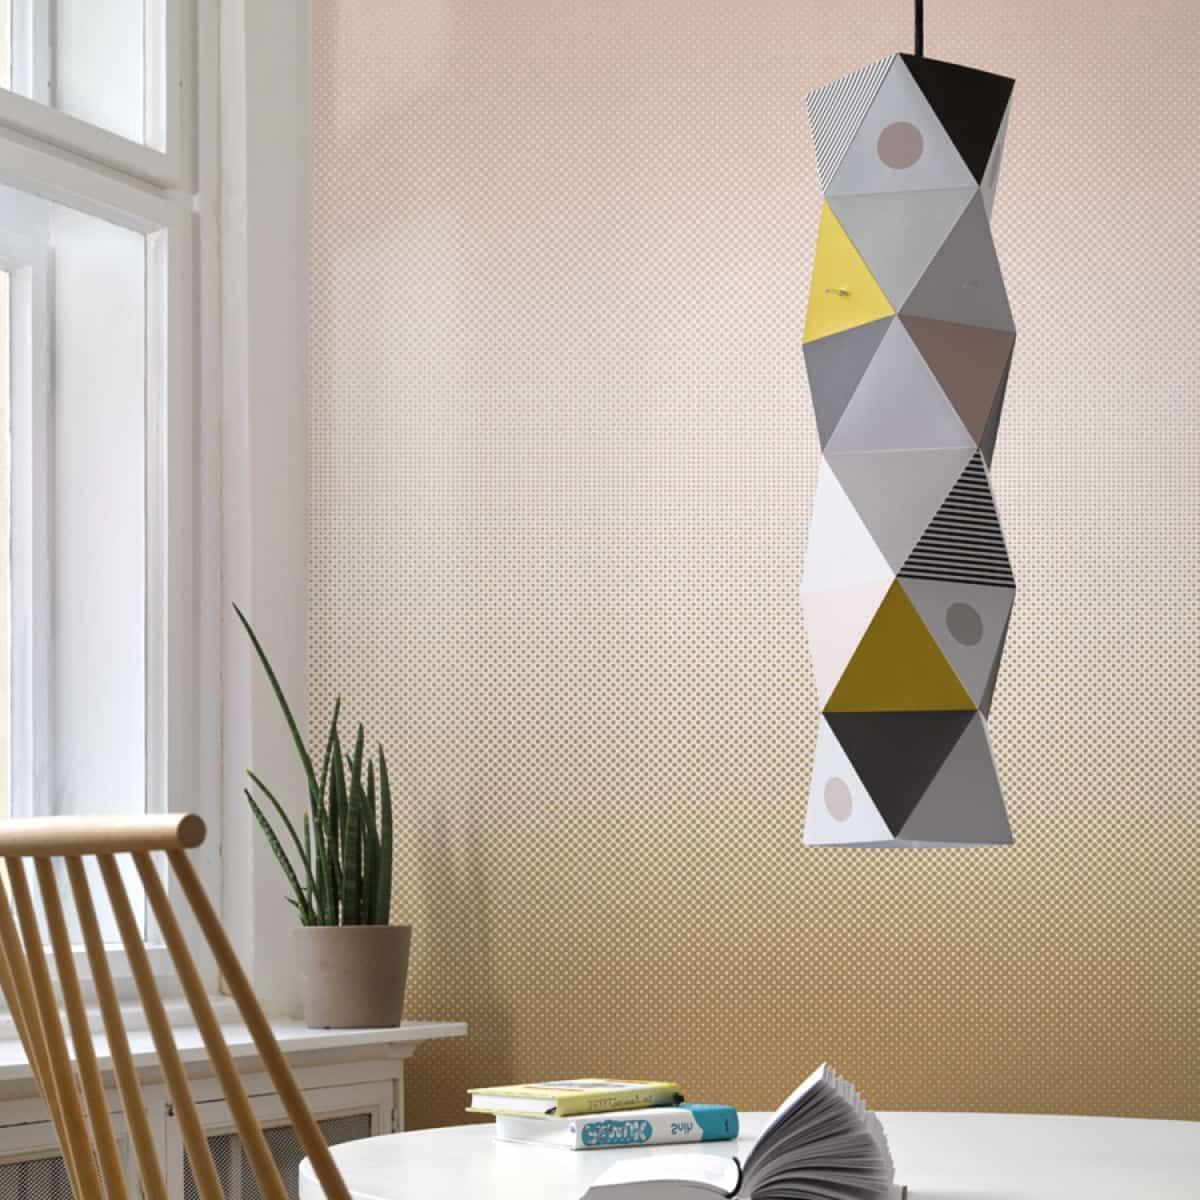 colt de bucatarie cu tapet alb, fereastra mare cu rame albe, o lustra moderna care atârna peste masa si scaun maro